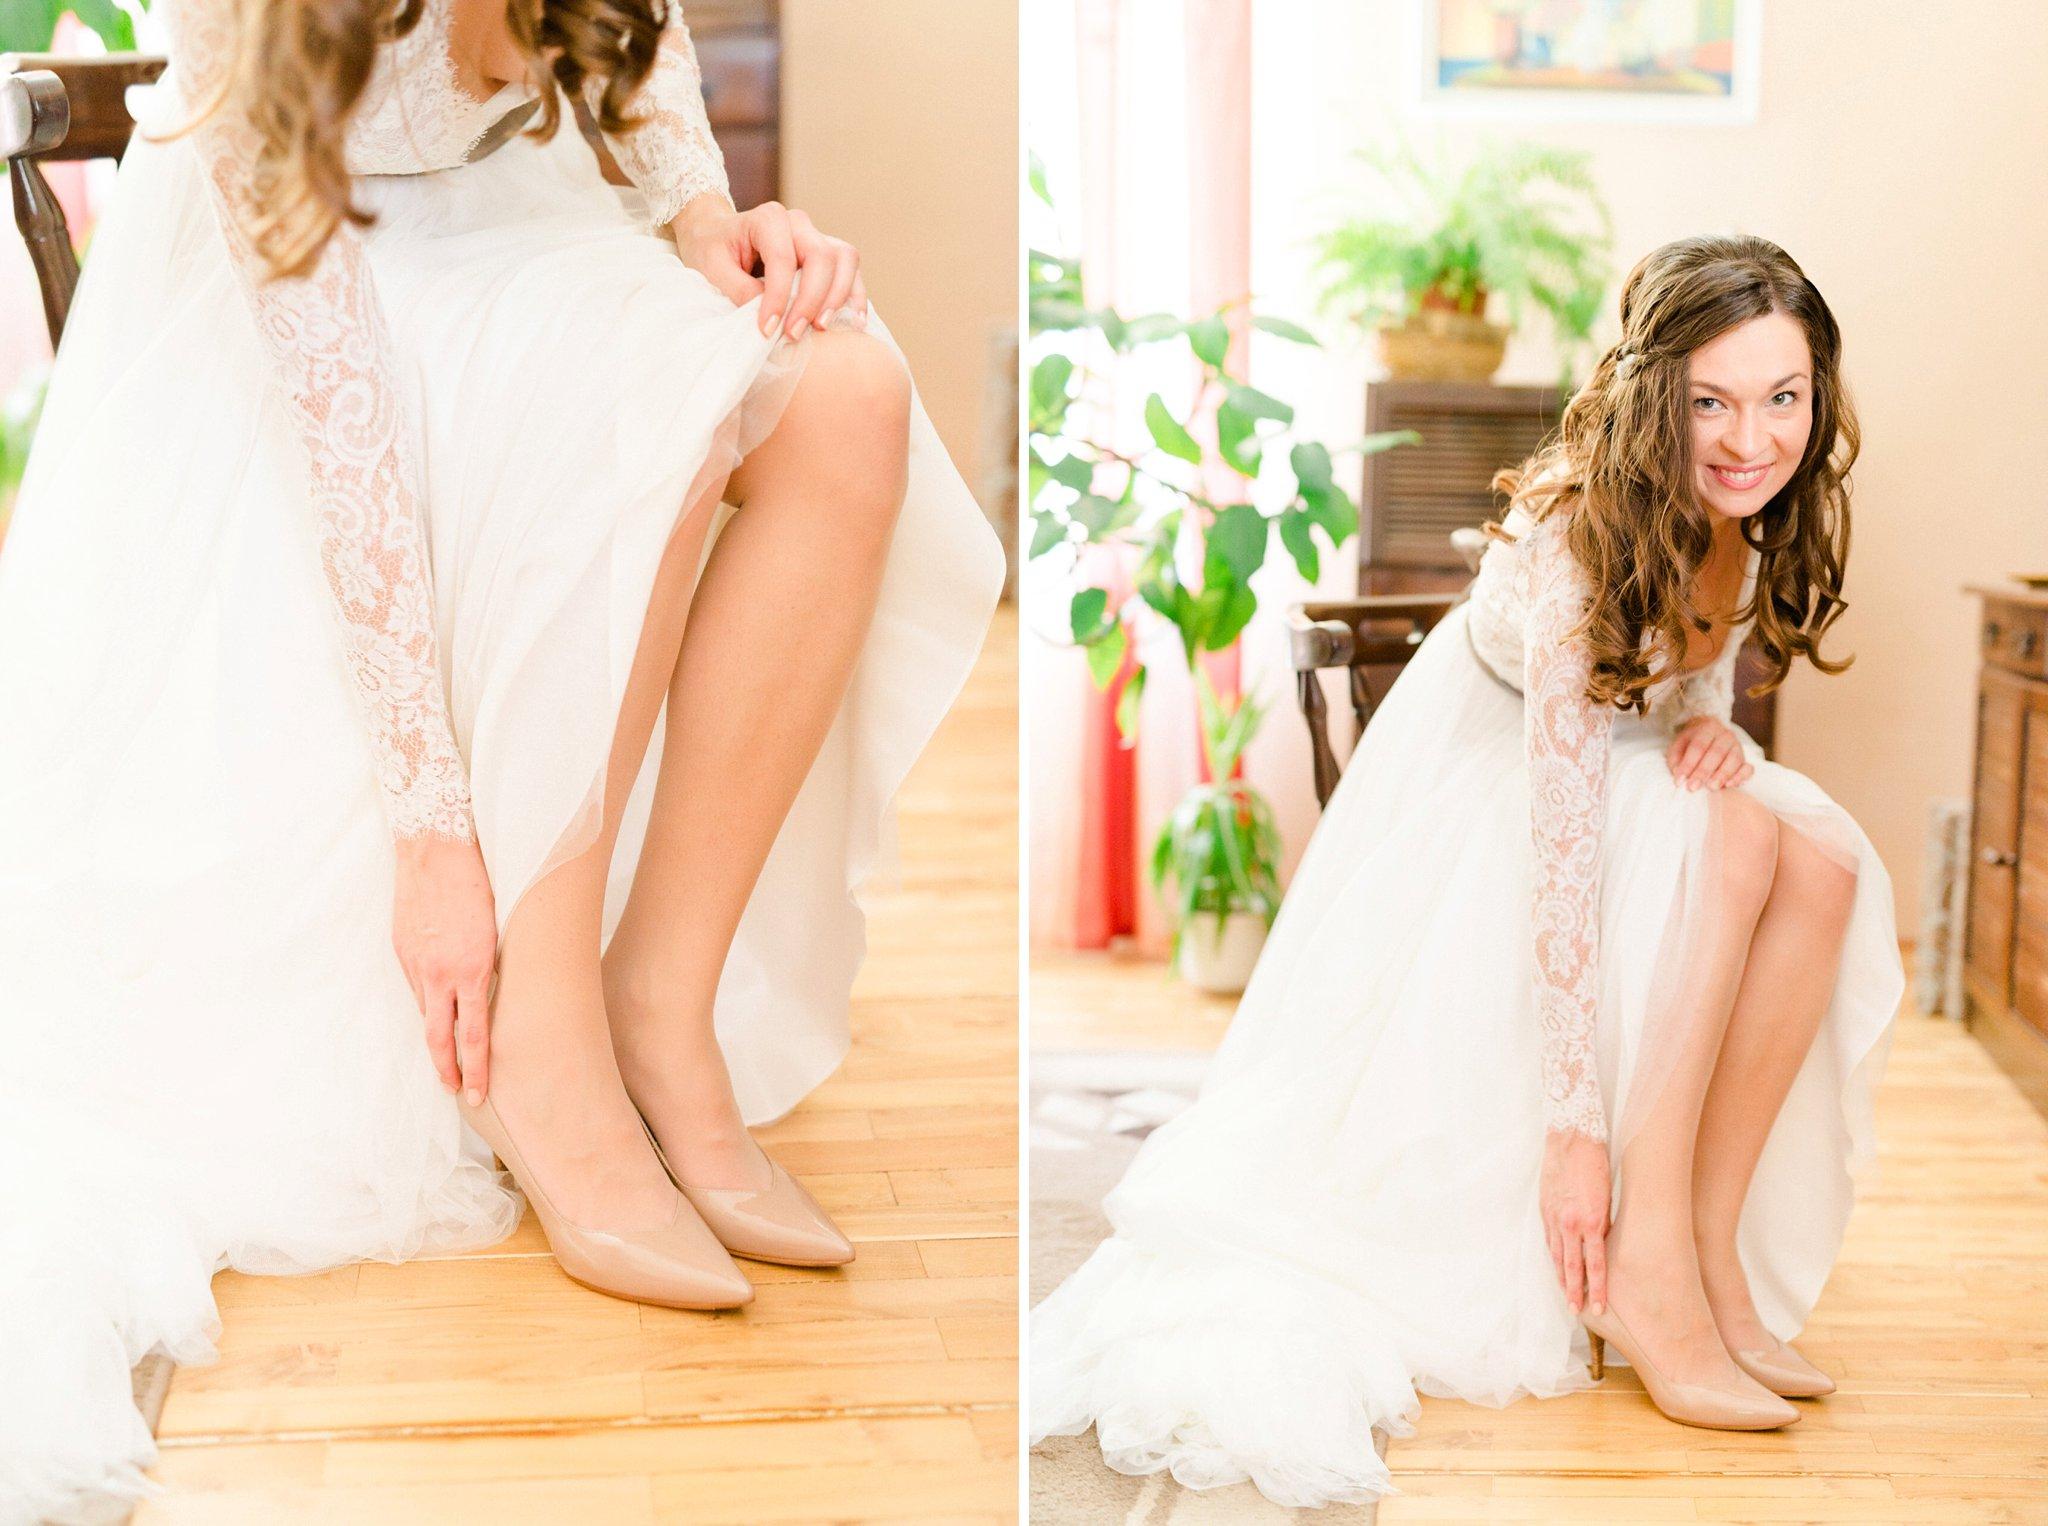 10-bride-getting-dressed-daalarna-cipo-felvetel-menyasszony-keszul